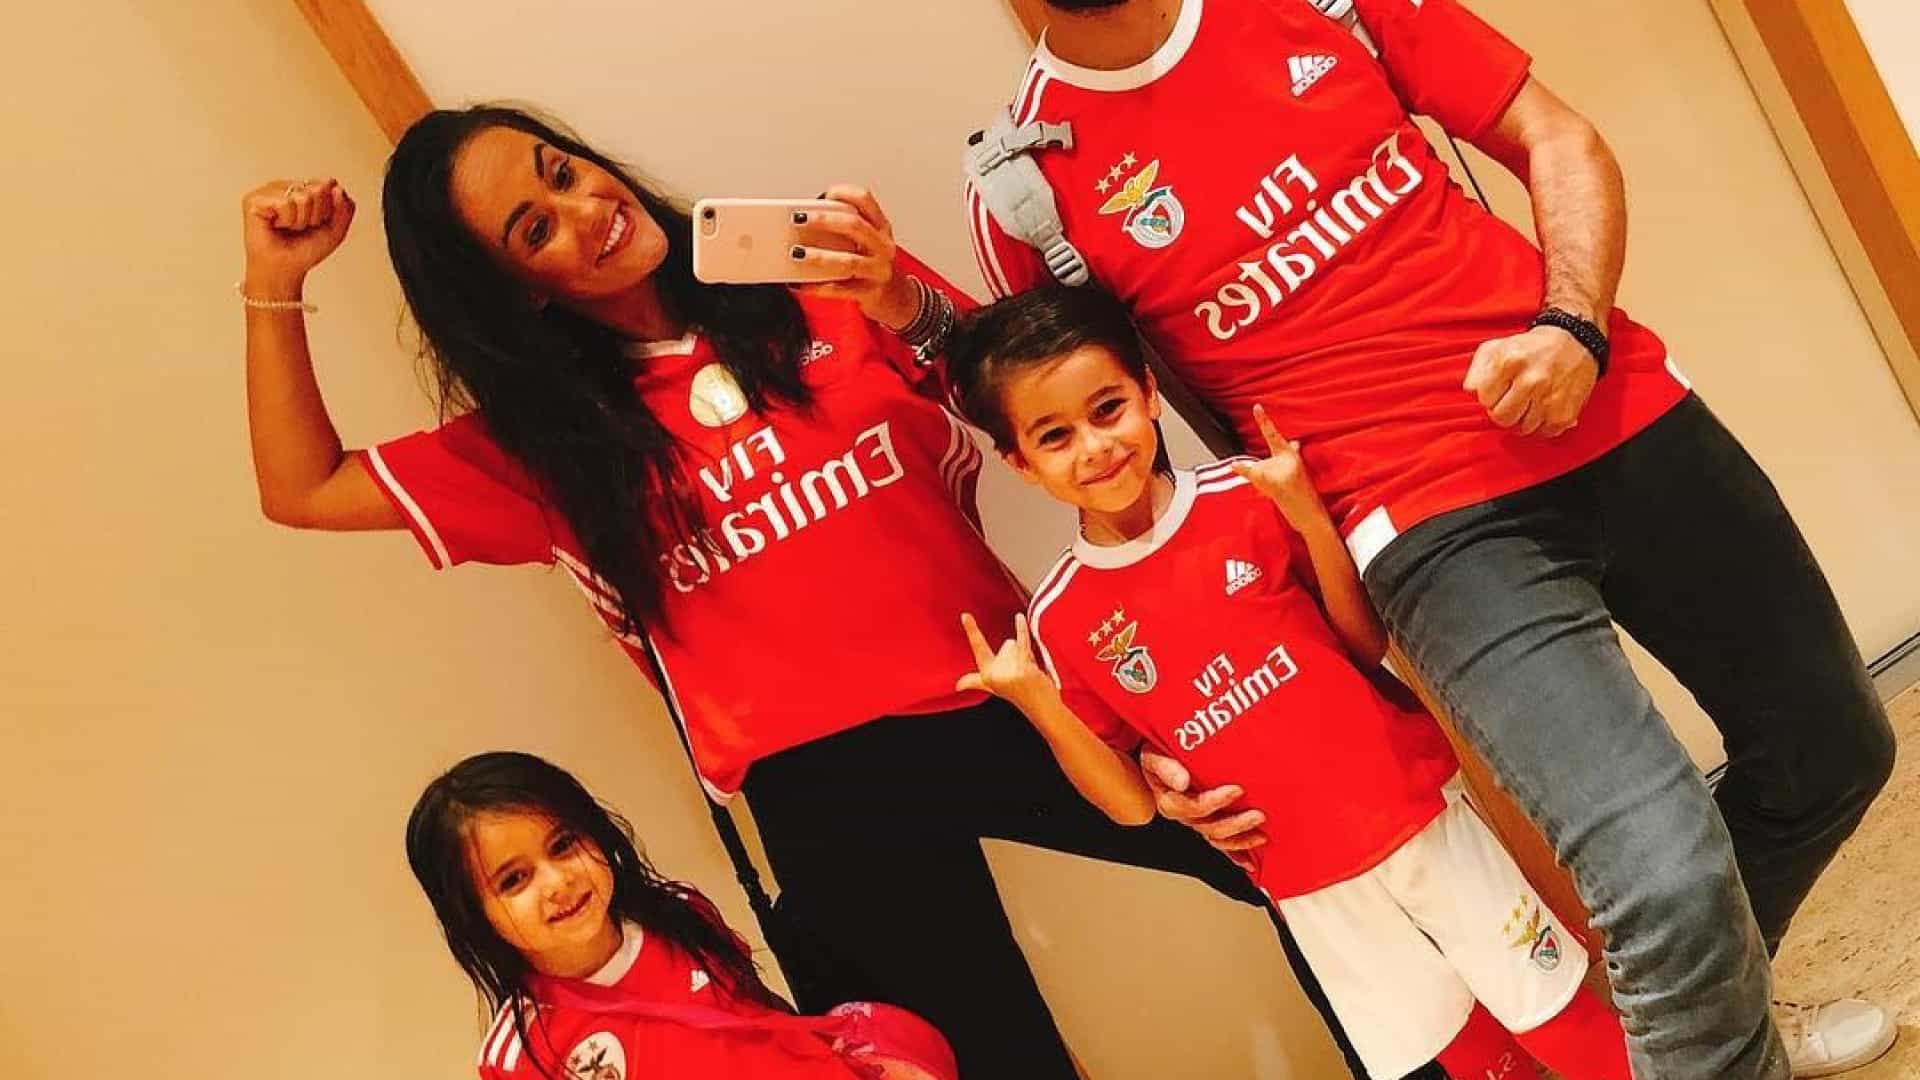 Família de Ricardo Pereira vestiu-se a rigor para apoiar o Benfica